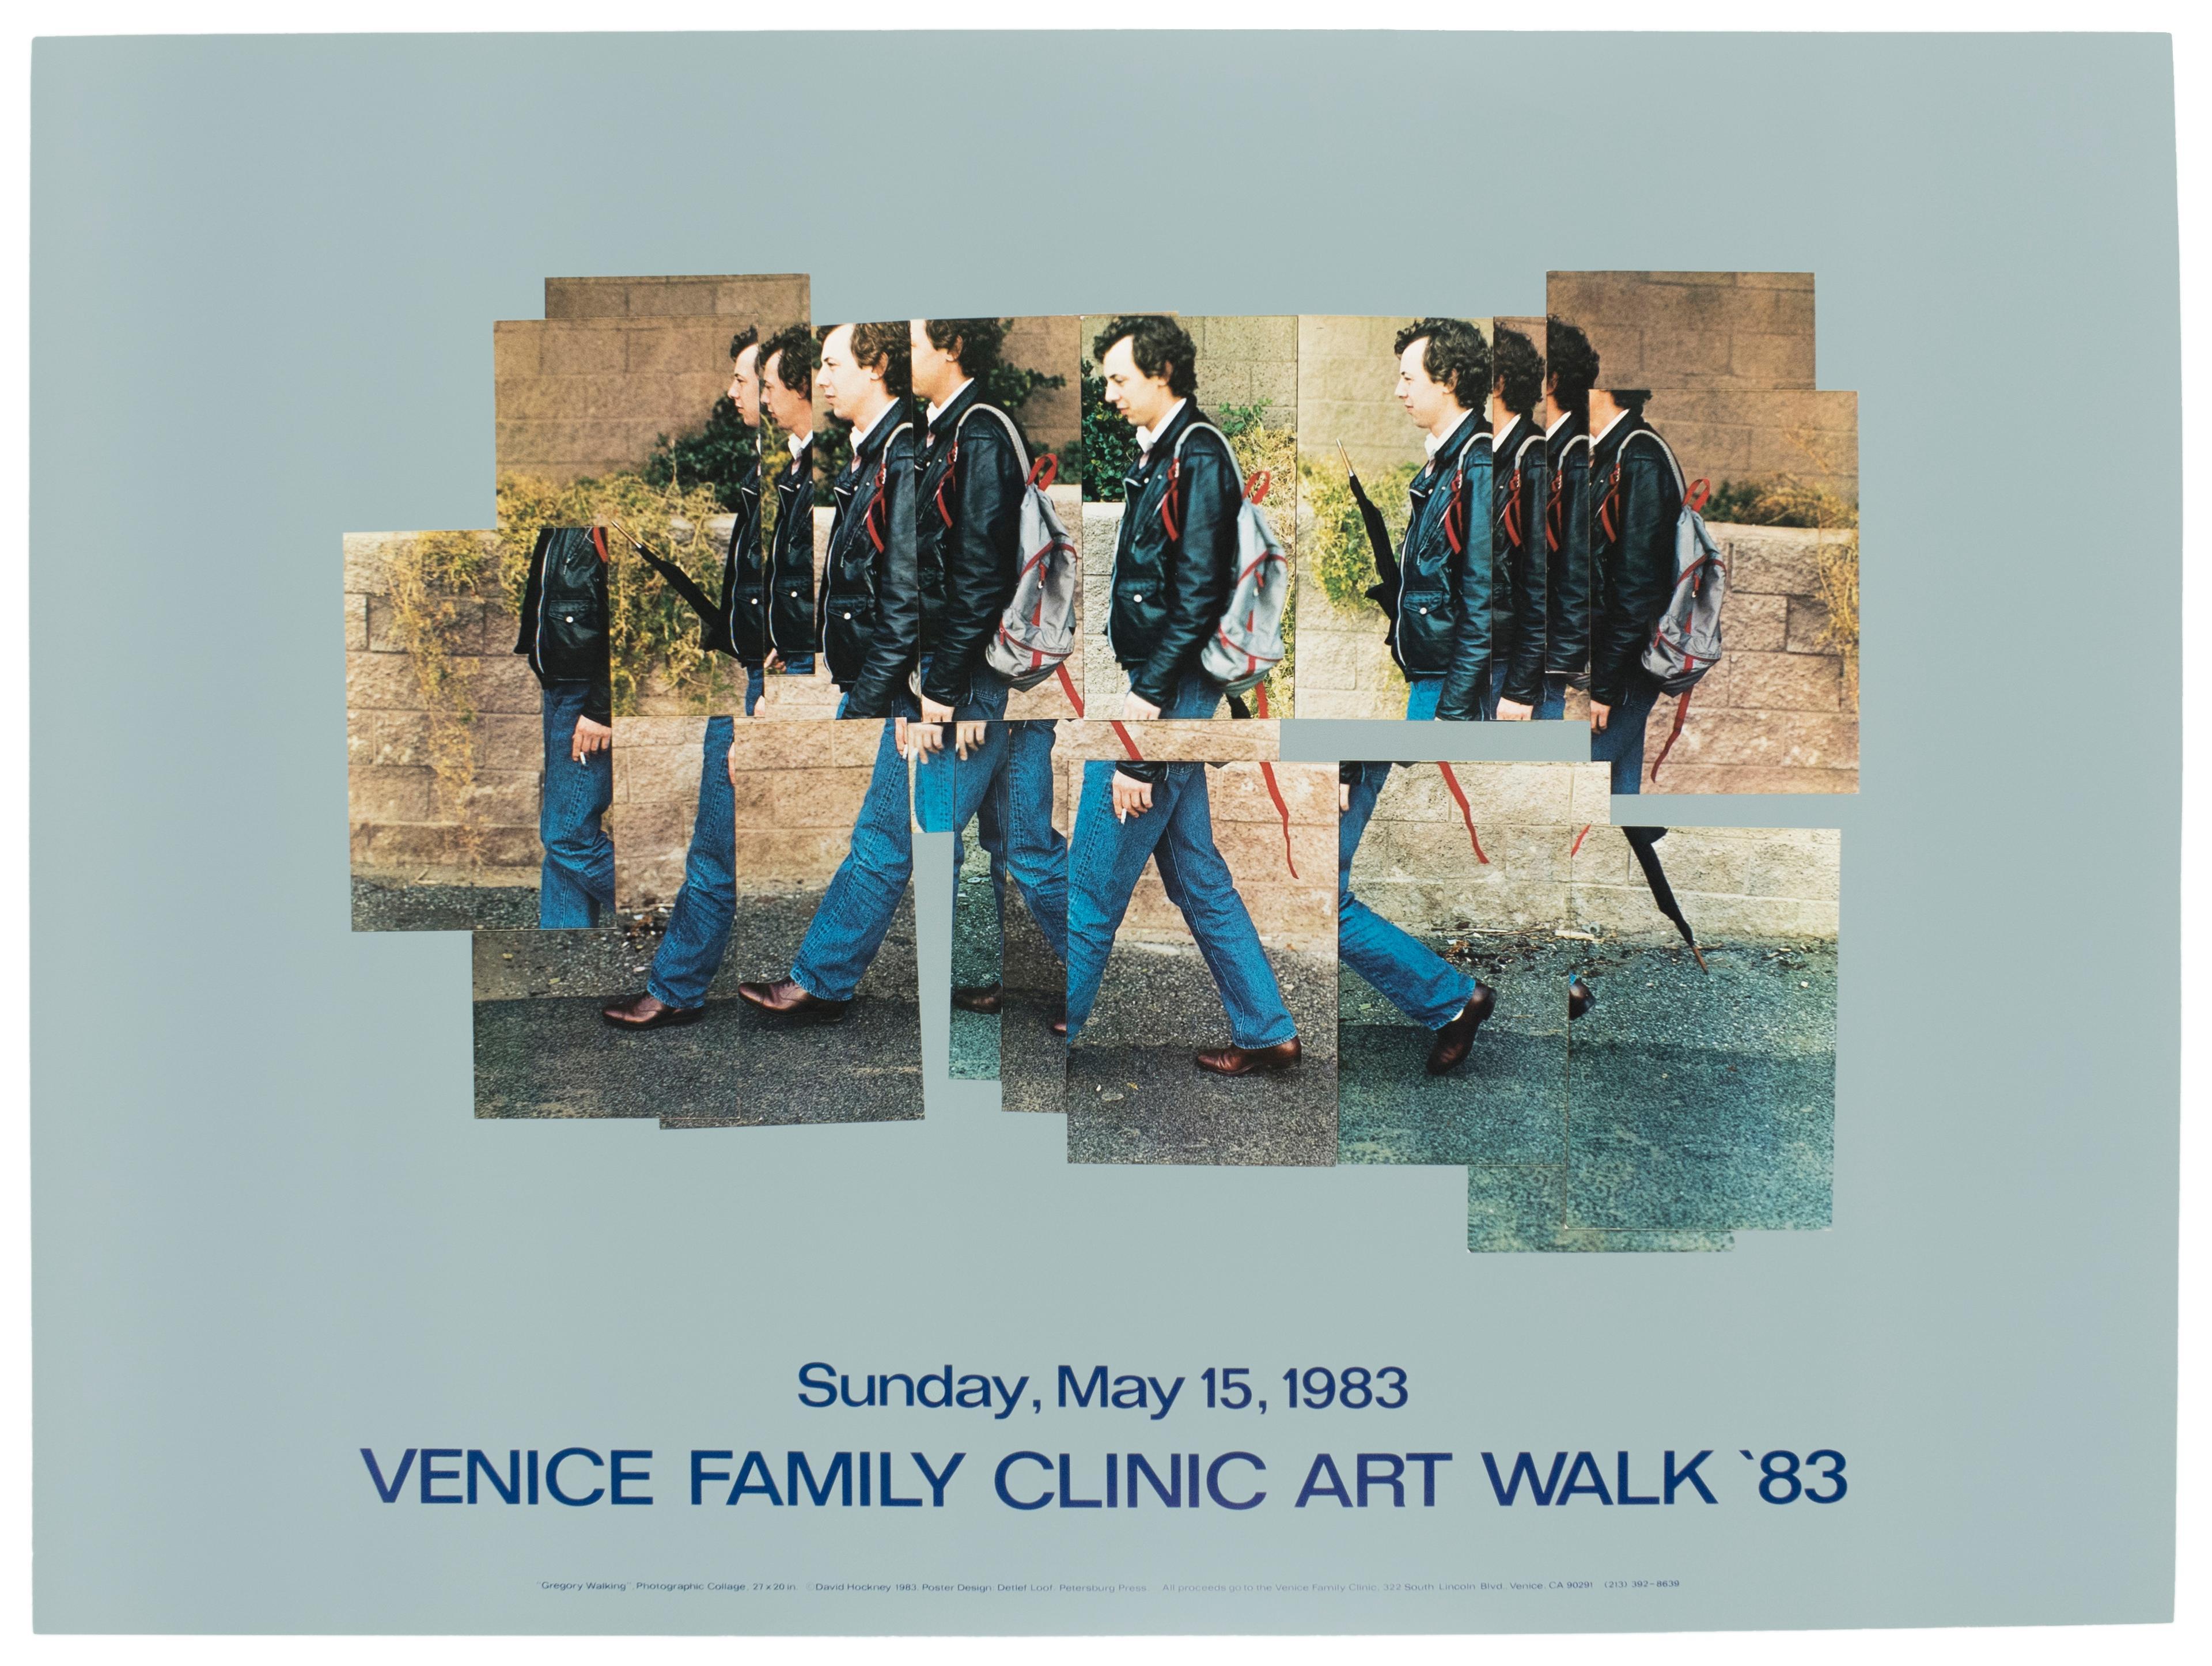 Venice Walk 1983 Vintage David Hockney Exhibition Poster in turquoise teal